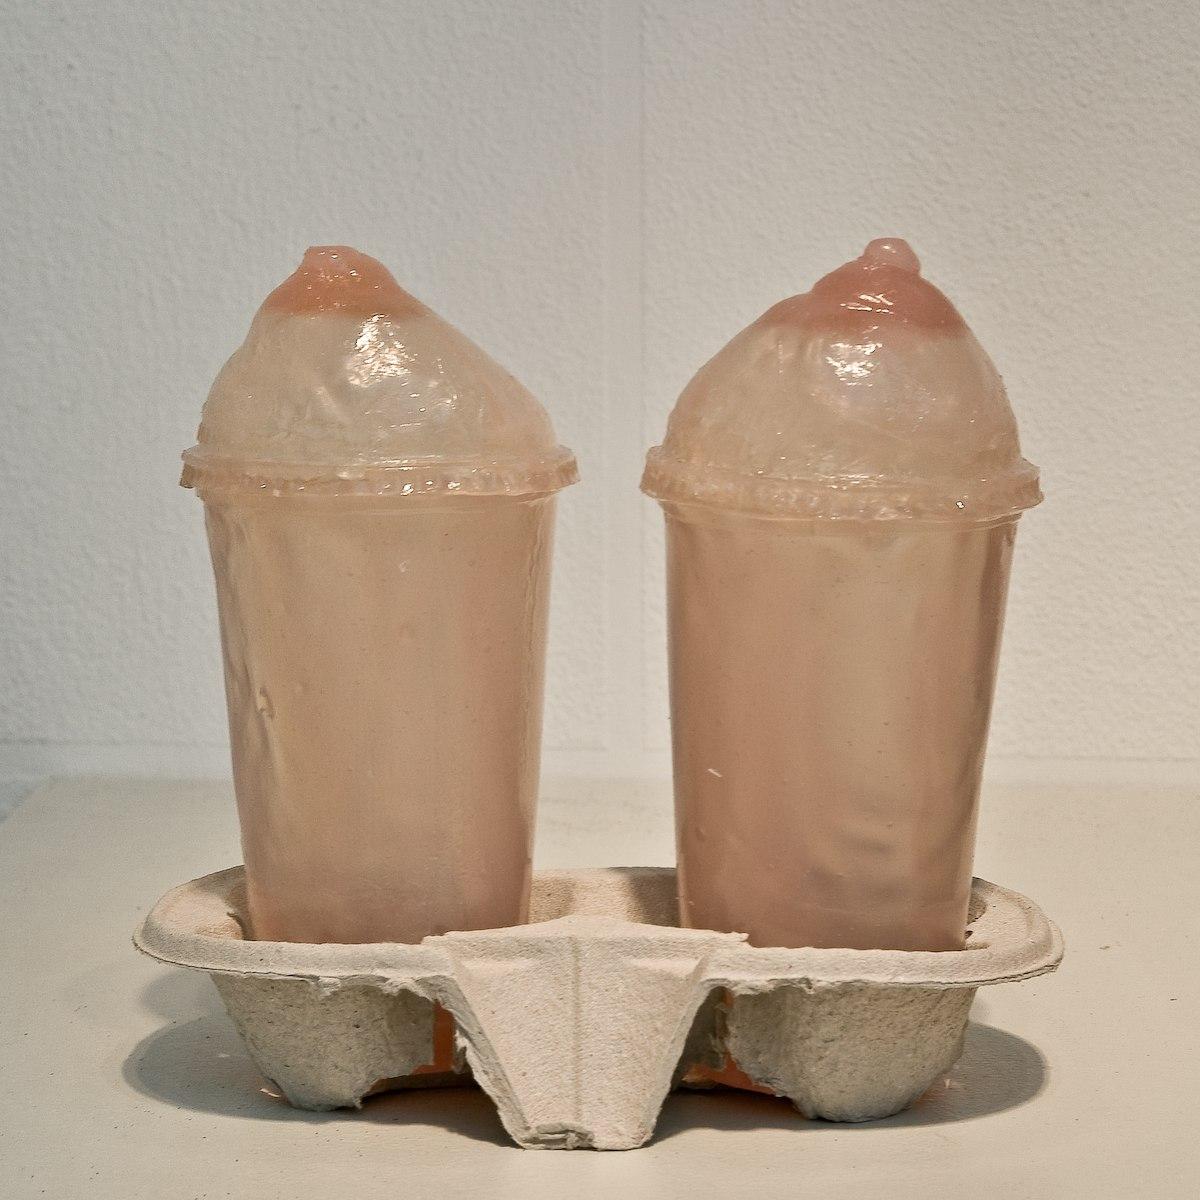 Soft Drink, 2009, resine, socle fast-food, 22 cm x 22 cm x 12 cm